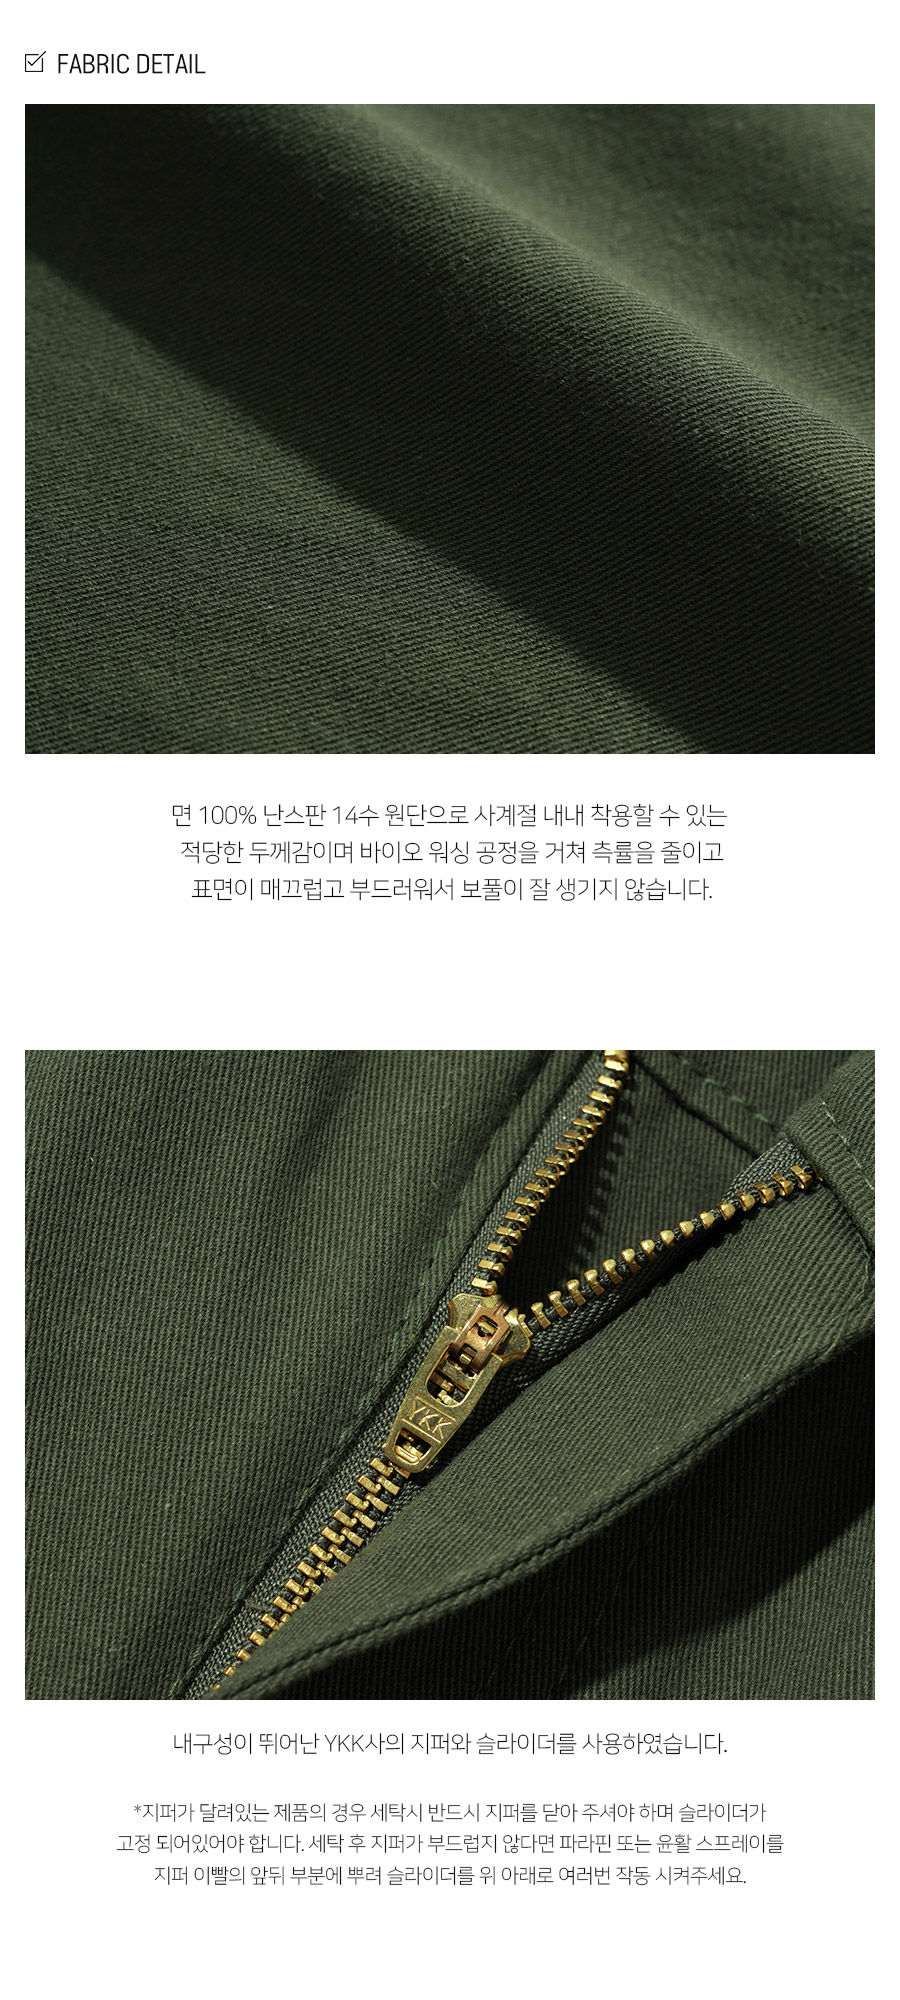 3_SJLP1285_info_fabric_sr.jpg